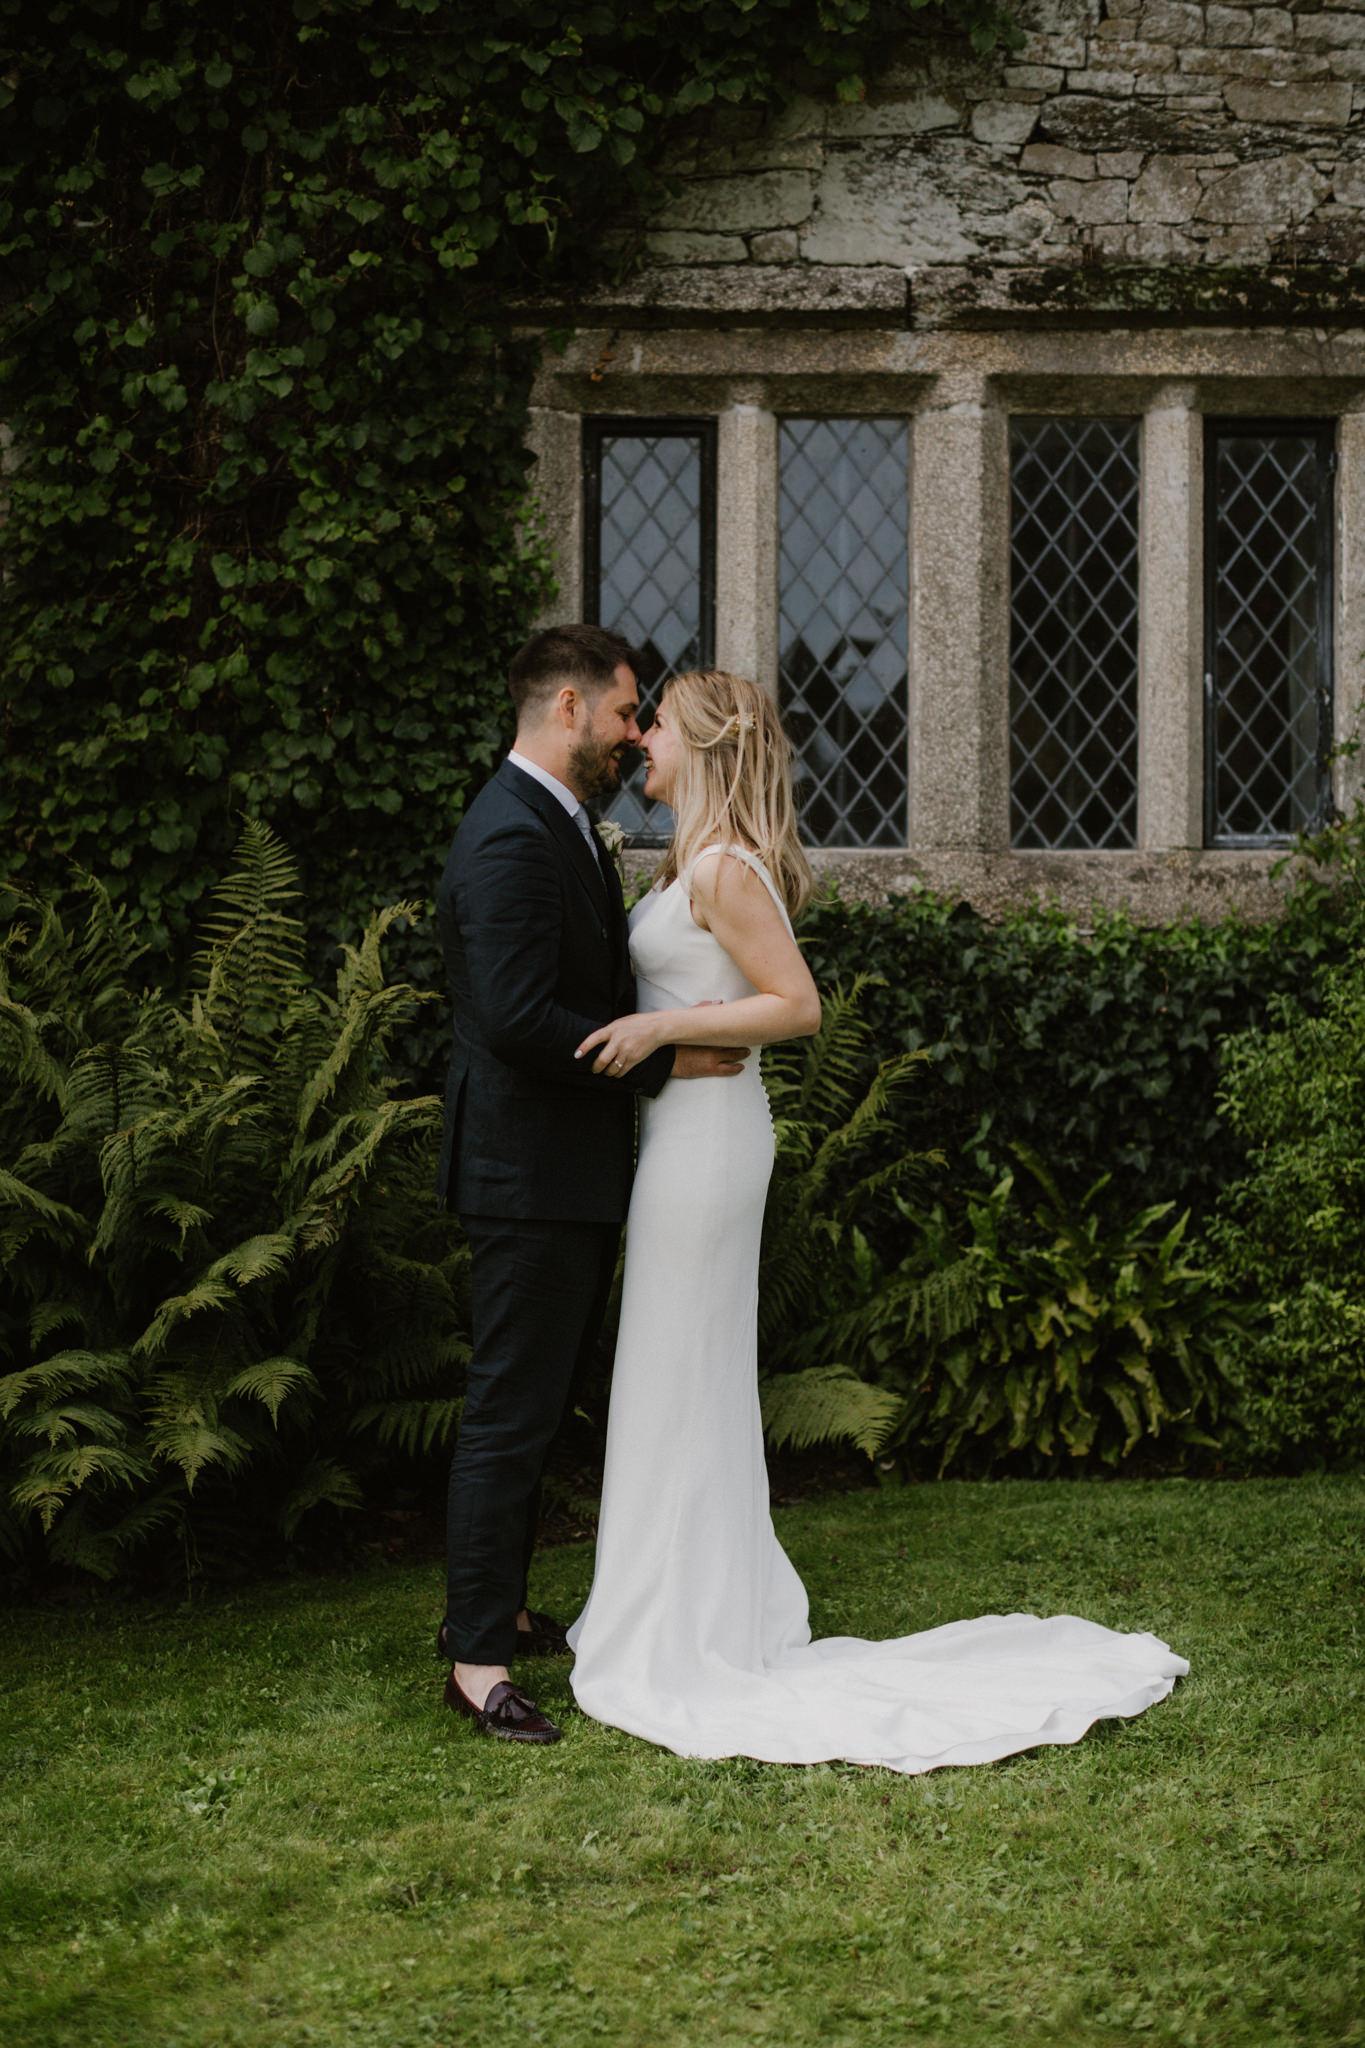 Heidi & Nick Wedding - River and Fern